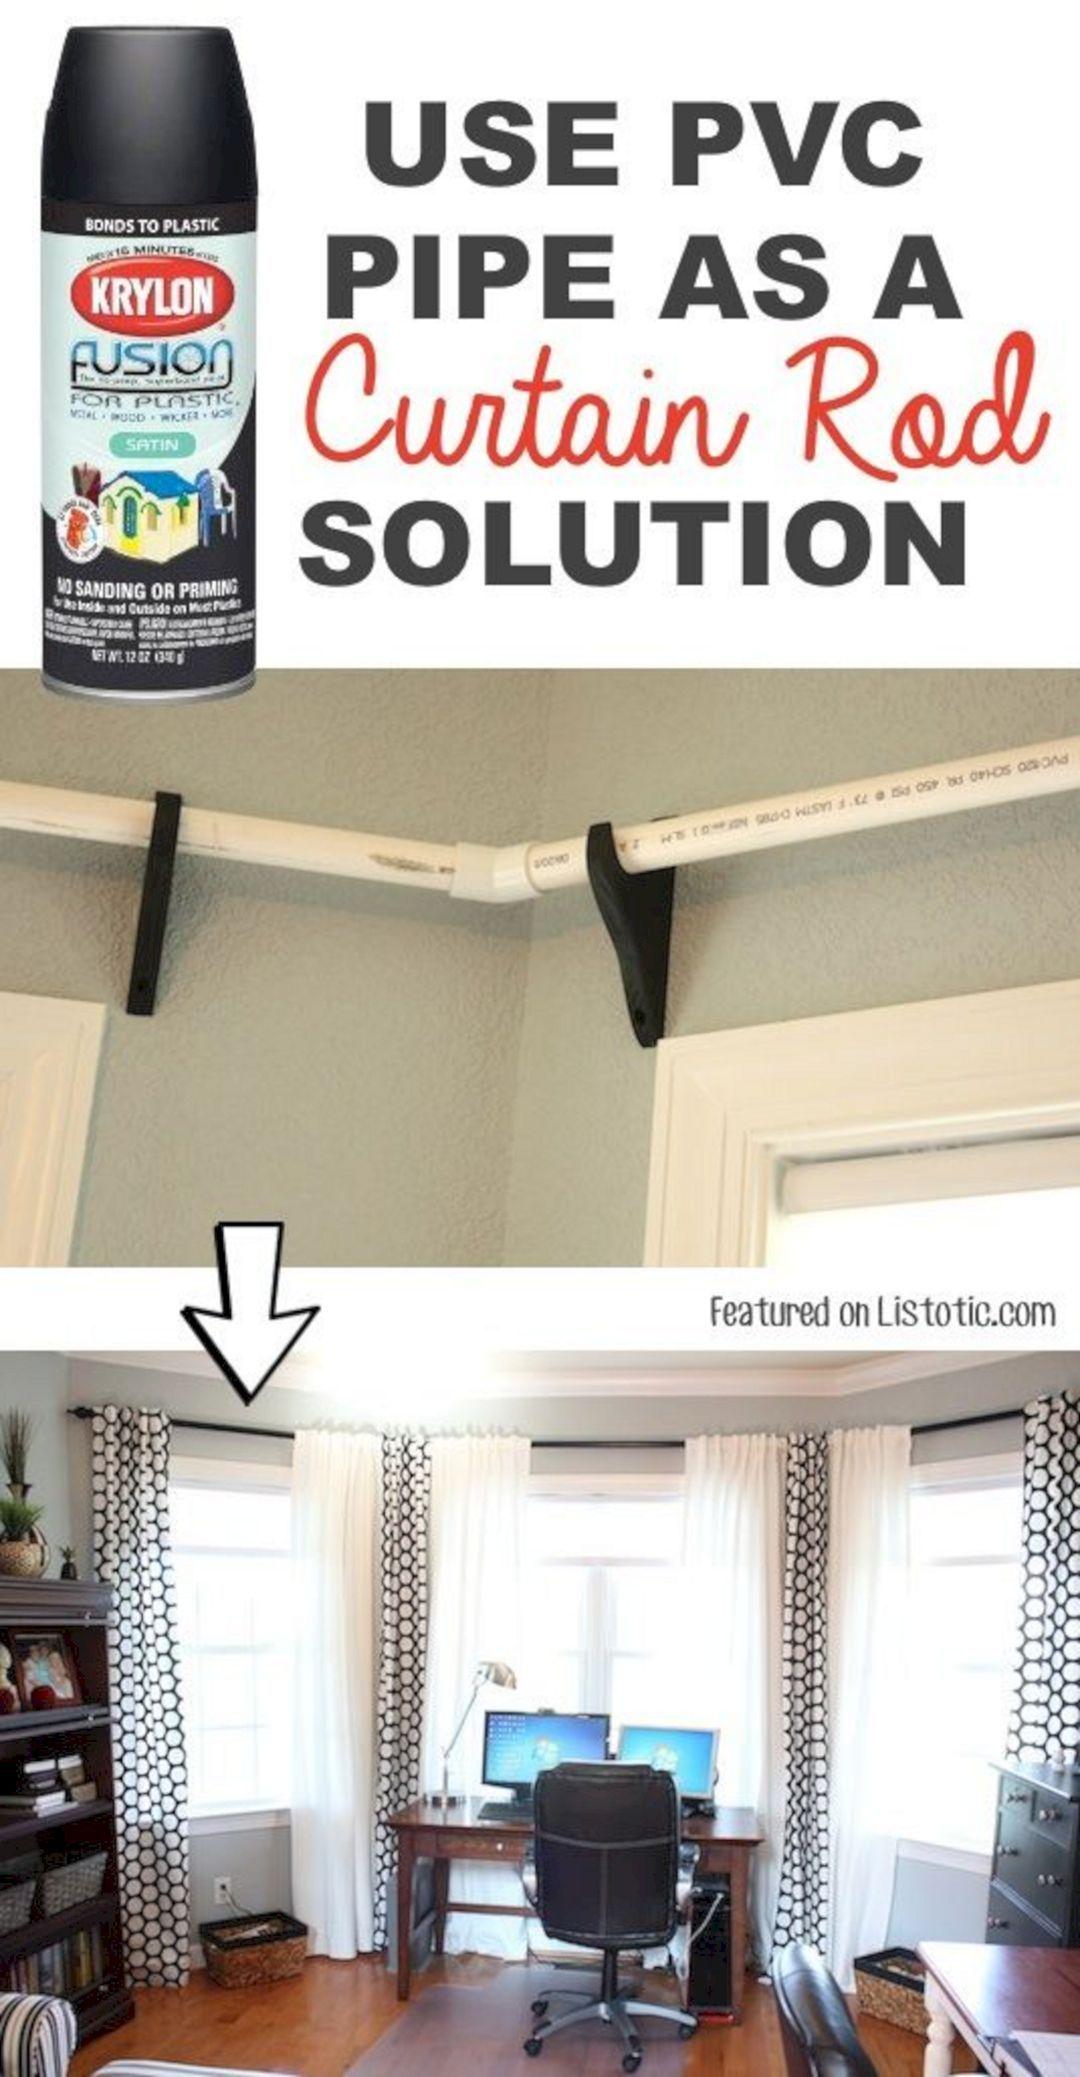 123 Best Inspirations Smart Home Renovation Ideas On A Budget 11301 ...